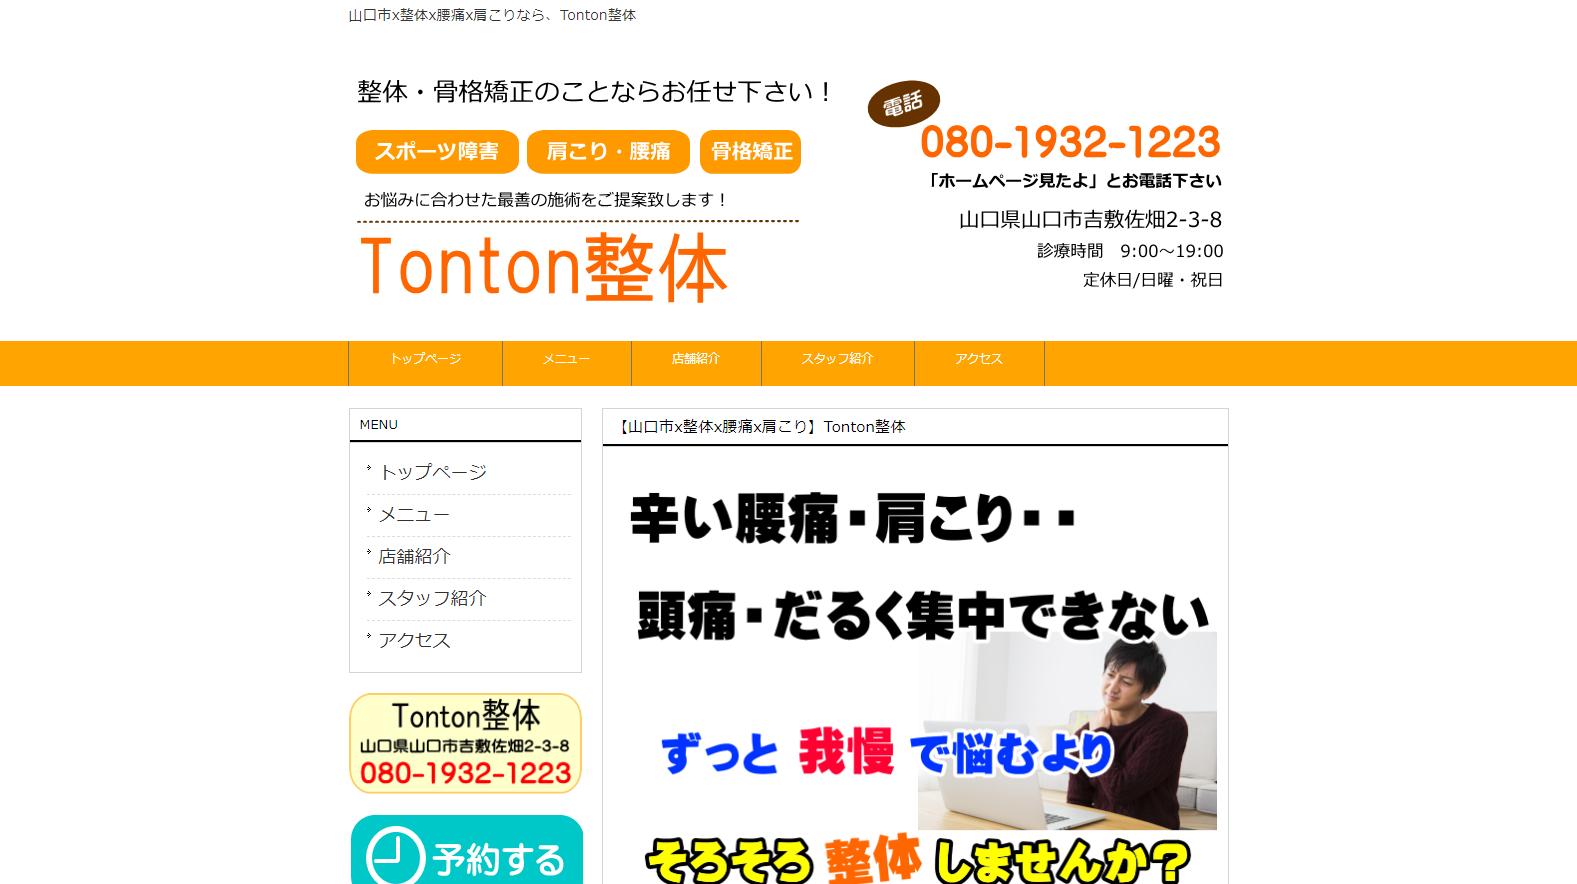 Tonton整体のサムネイル